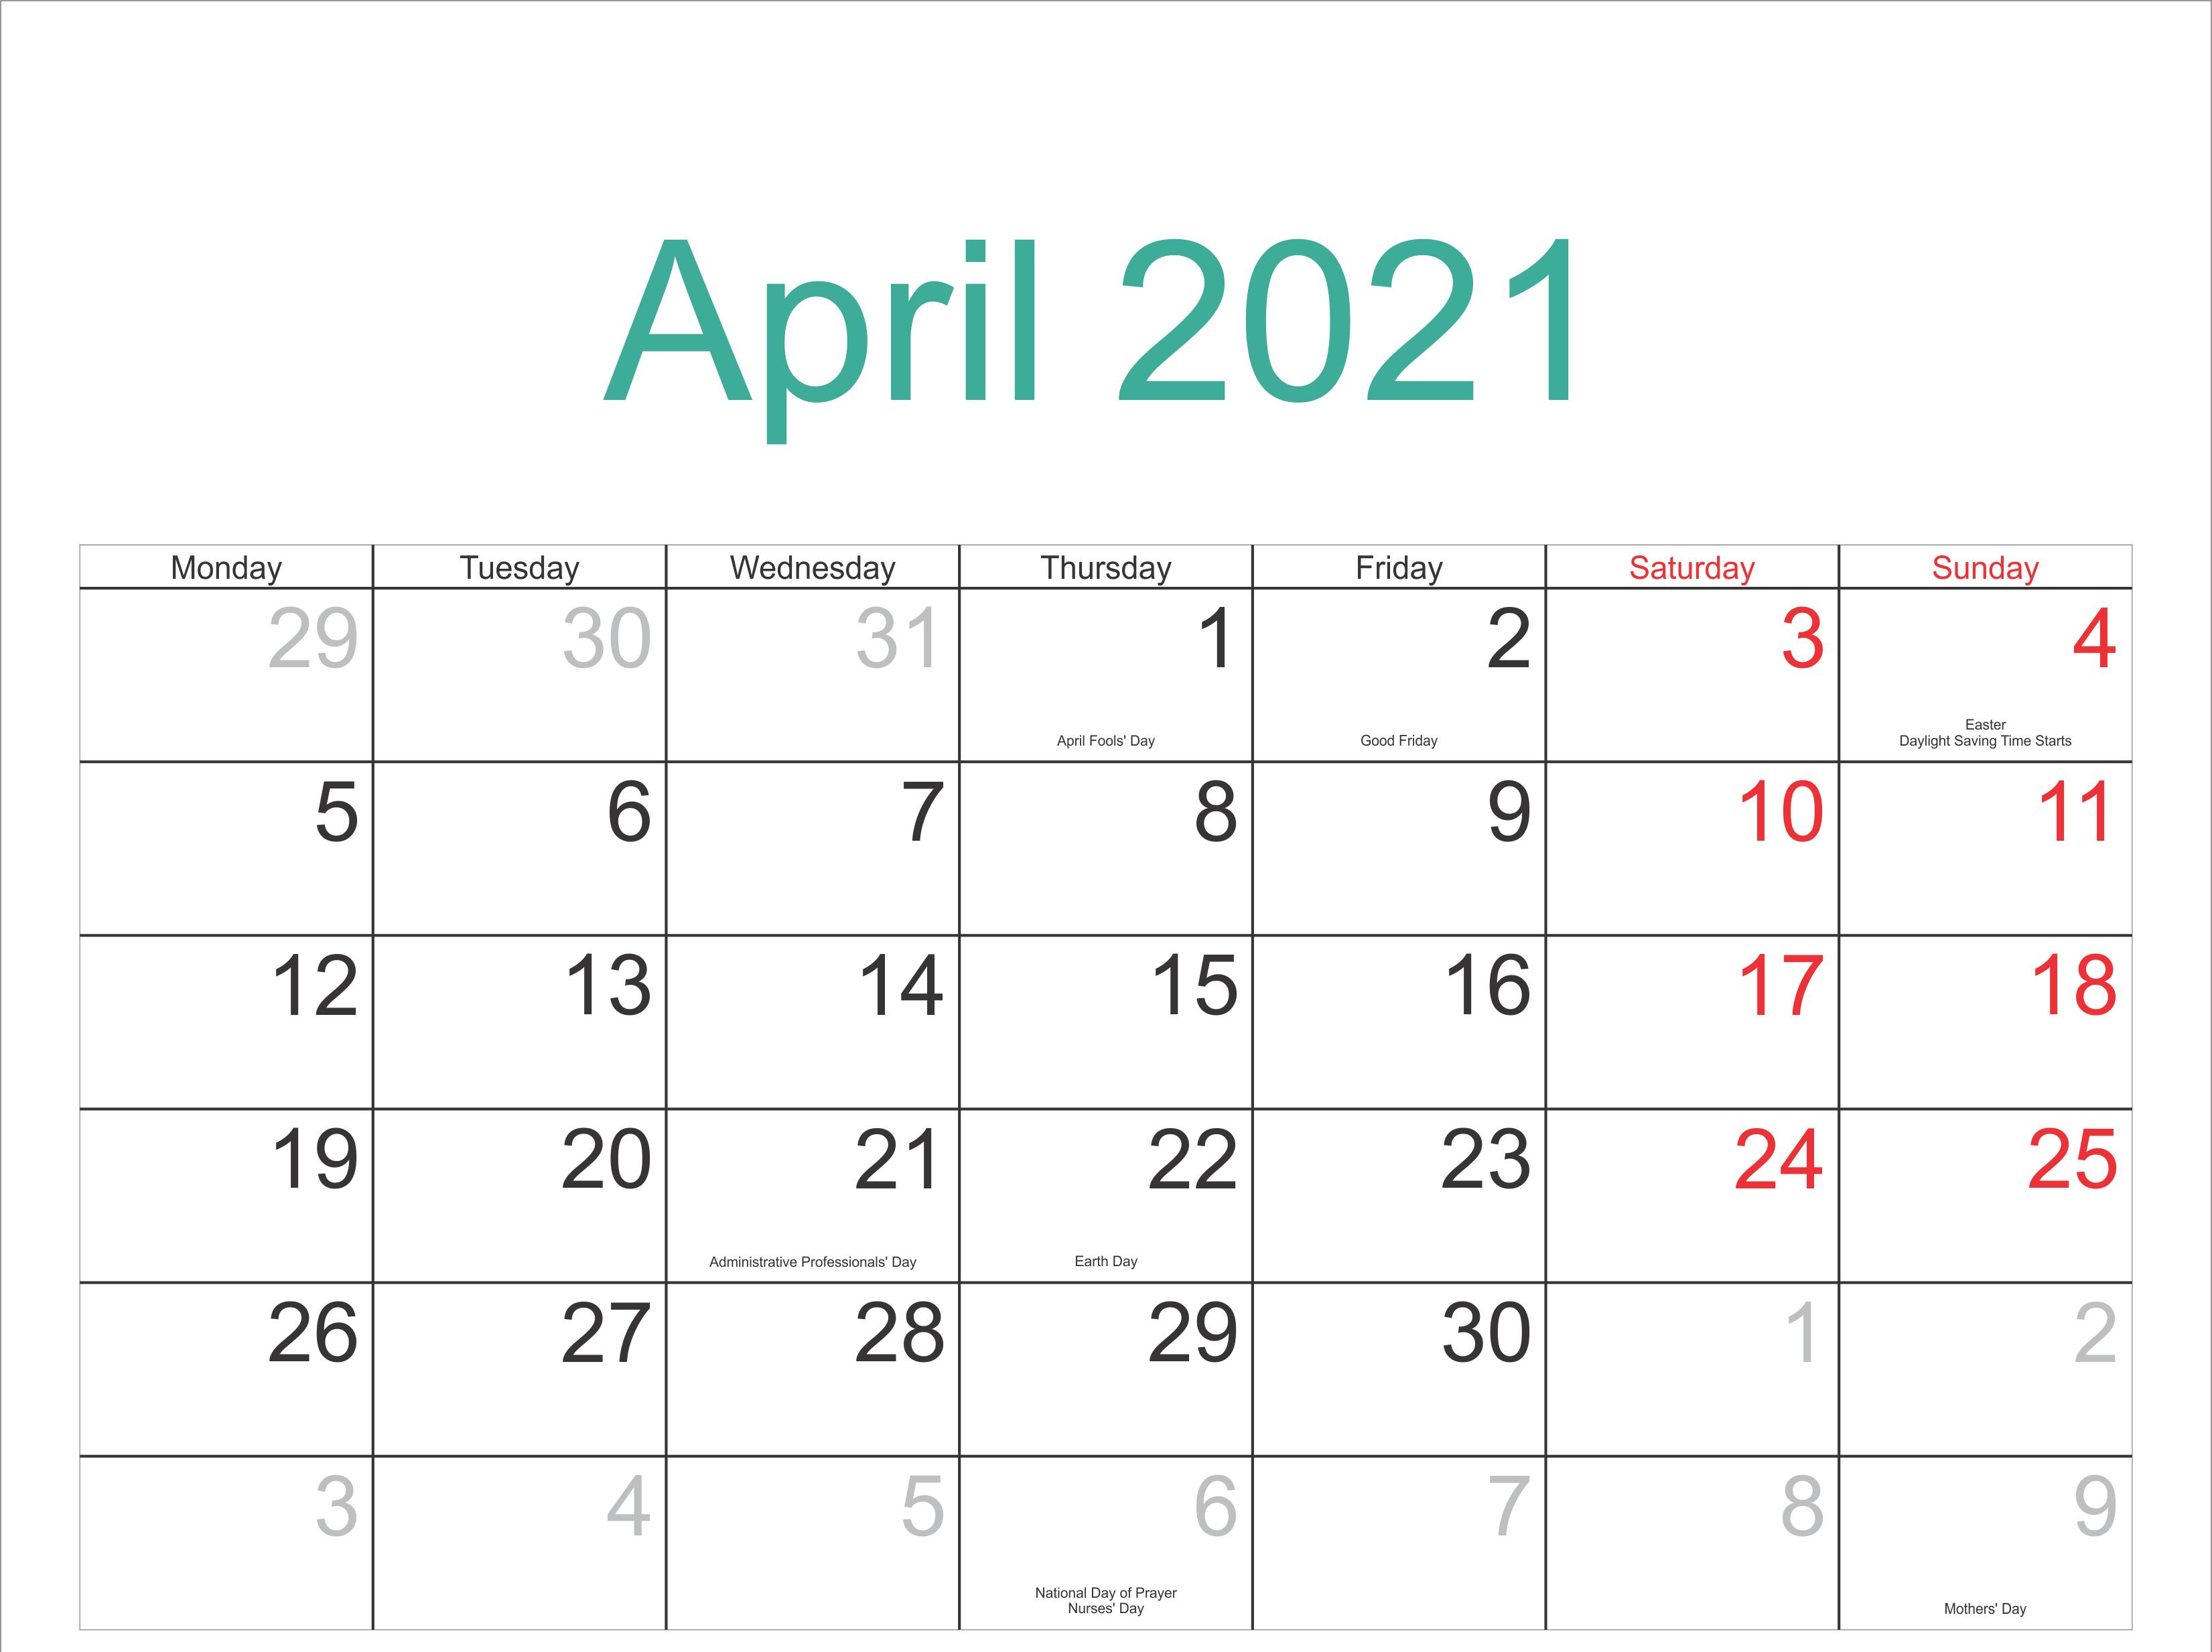 April Holidays 2021 Calendar